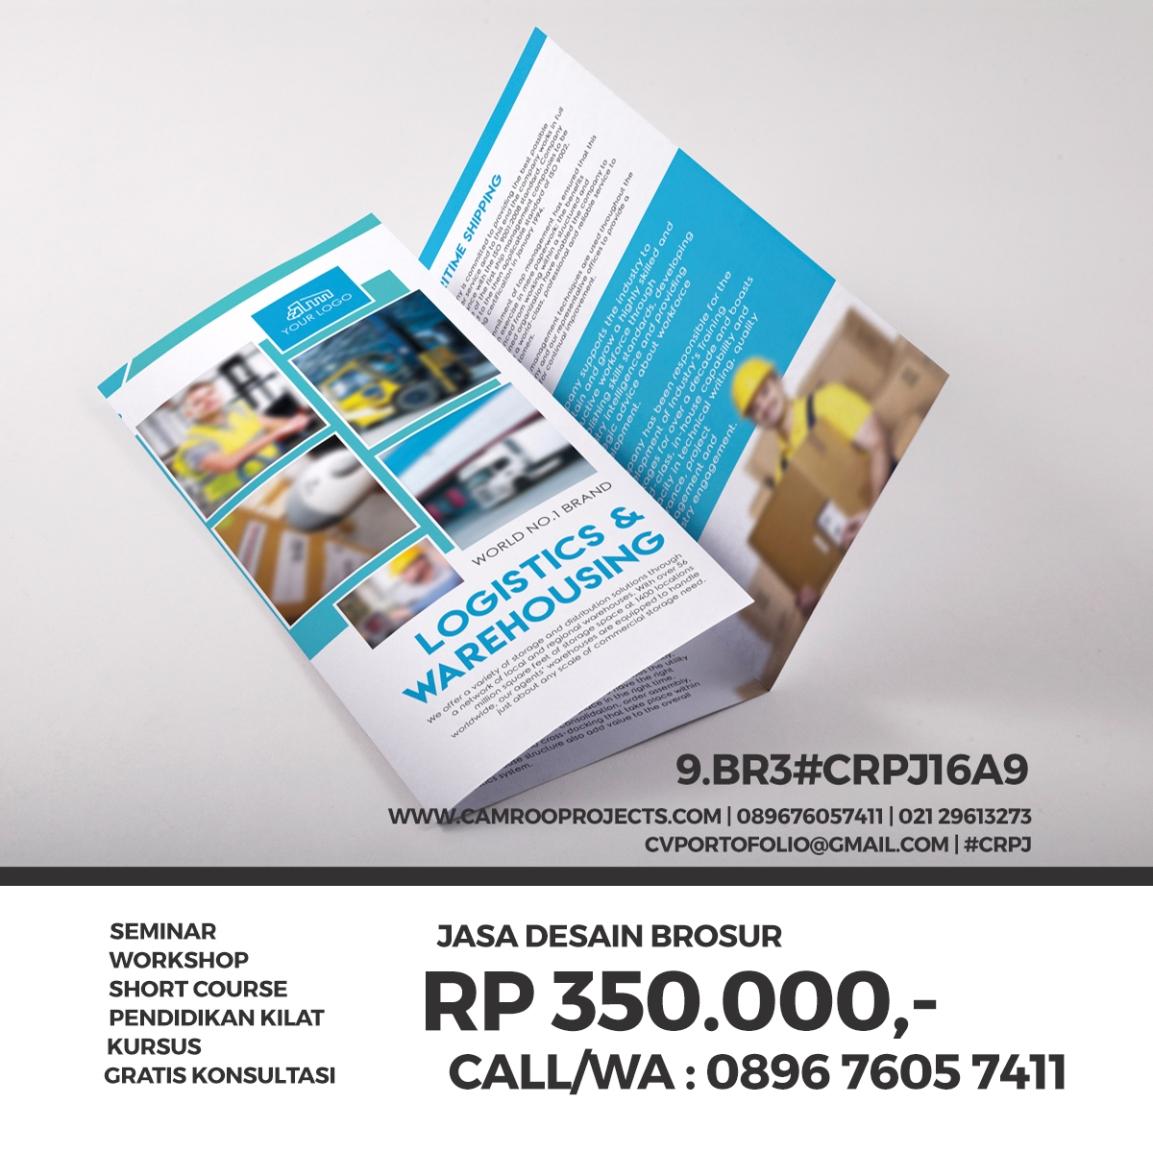 Jasa Desain Flyer | bagus | Call/WA 0896 760 574 11